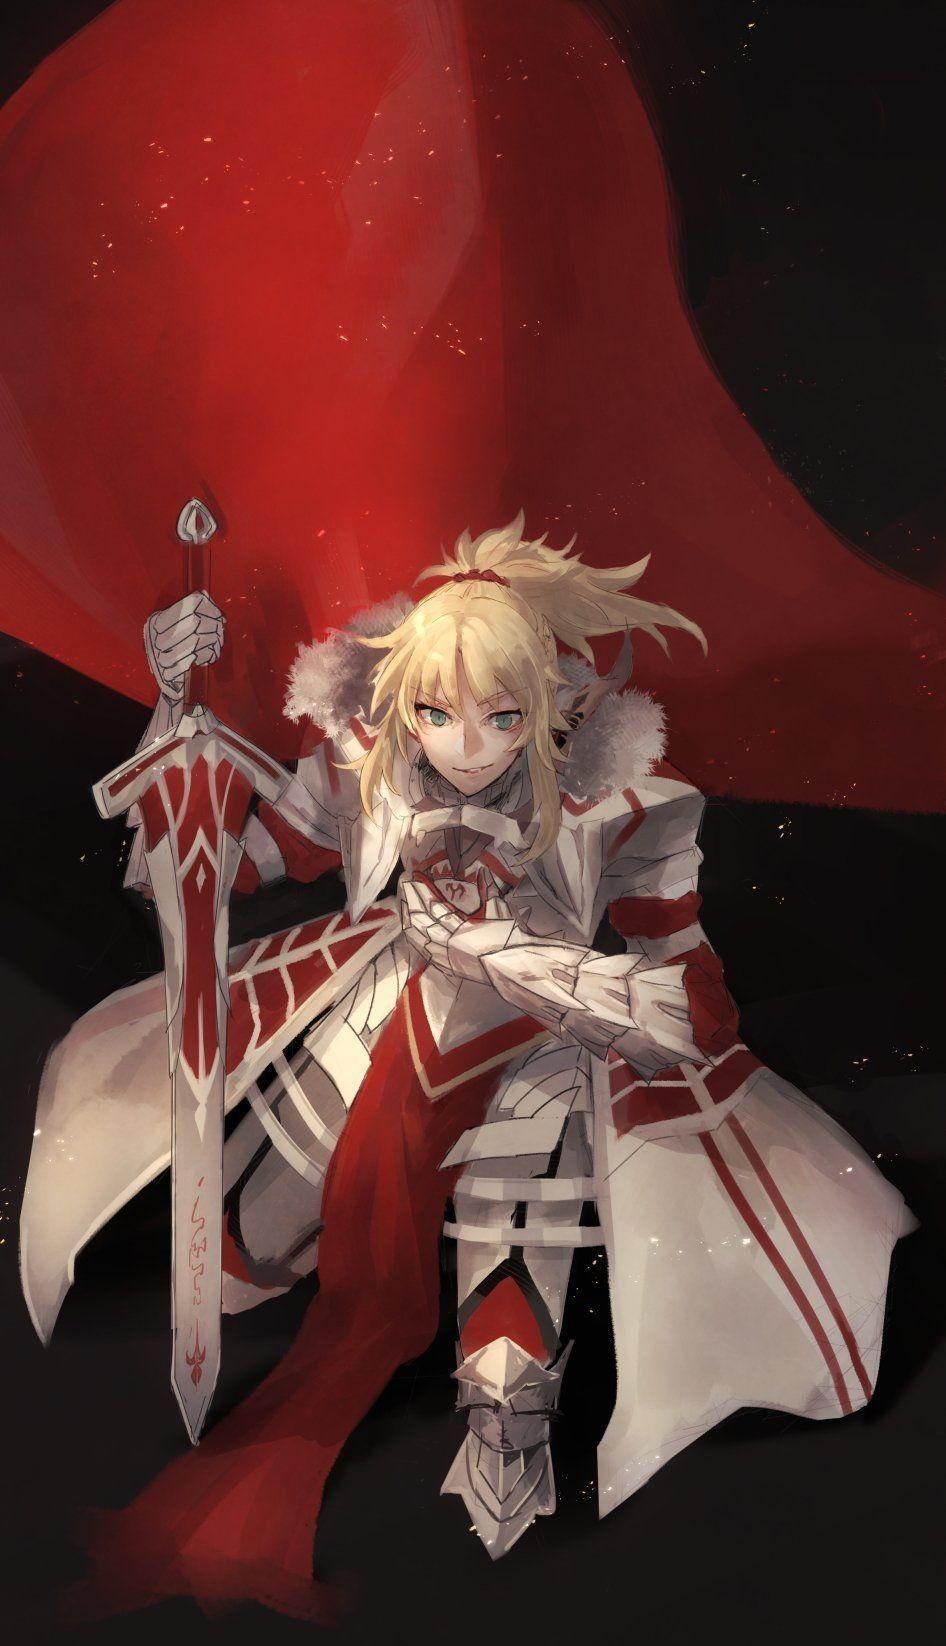 Shield Hero Meets Shielder Servant Fate Anime Series Anime Fate